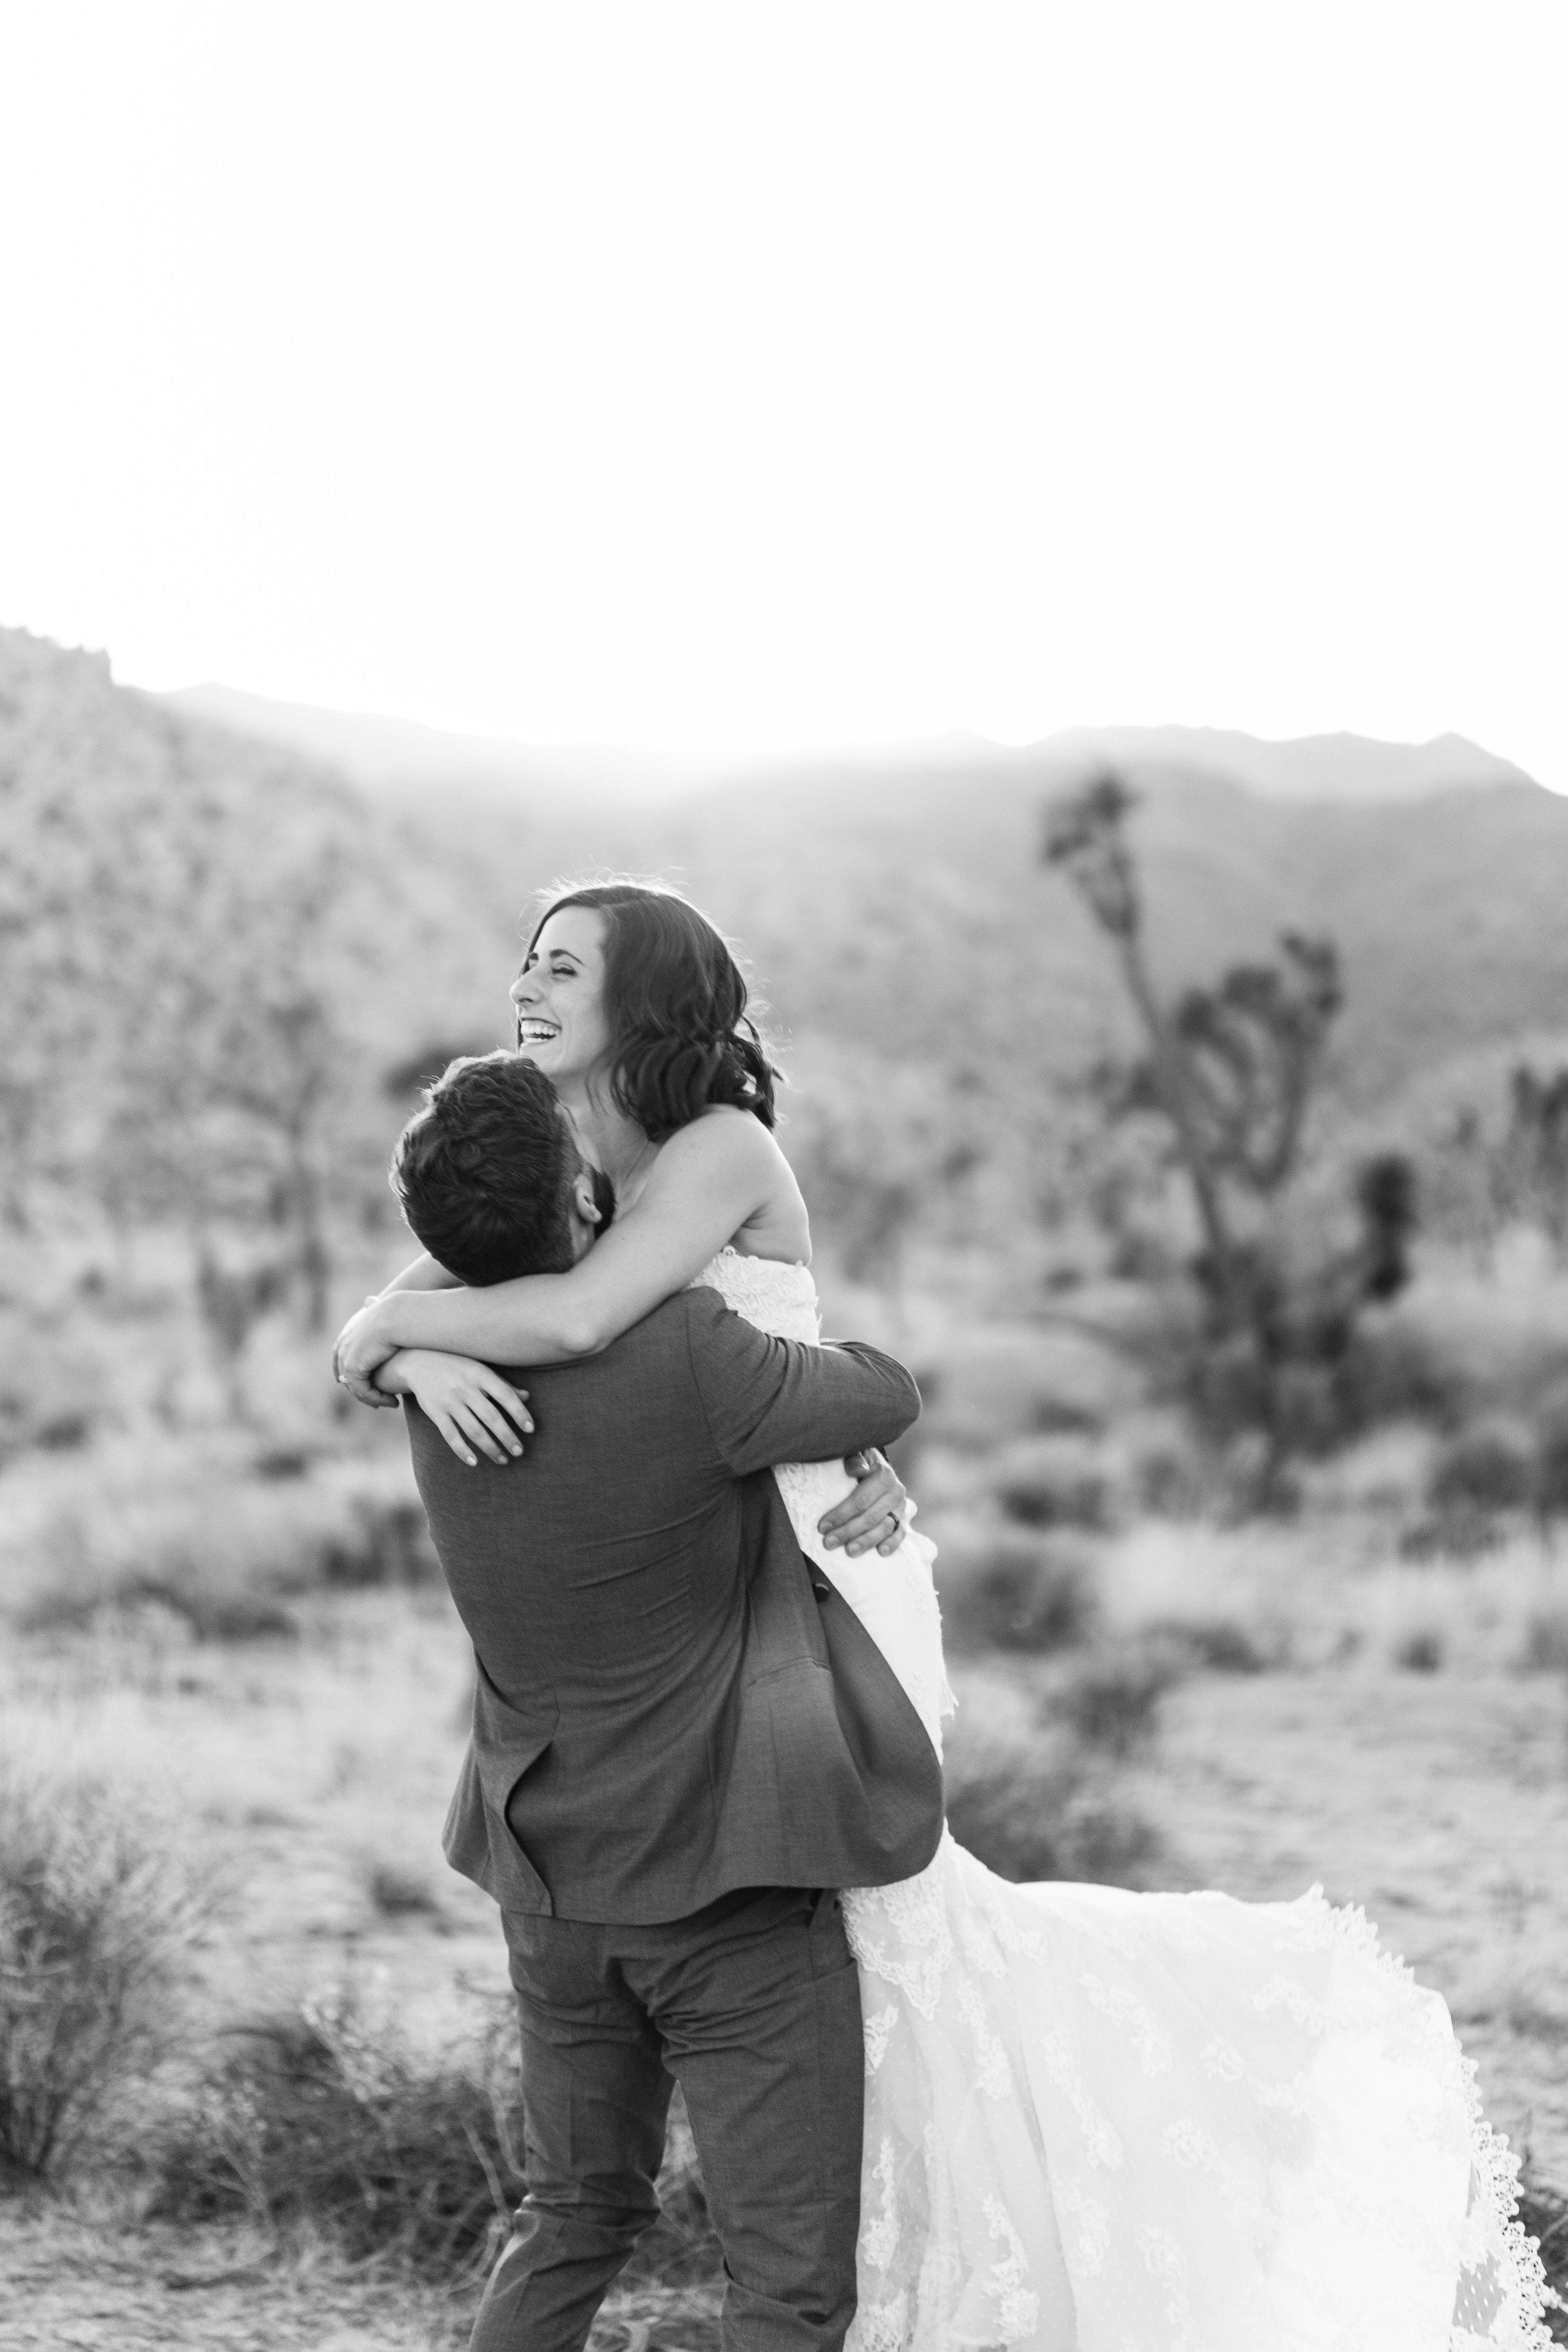 nicole-daacke-photography-joshua-tree-adventurous-elopement-wedding-national-park-wedding-photographer-adventure-wedding-adventurous-elopement-jtree-joshua-tree-national-park-wedding-photographer-intimate-weddings-golden-desert-love-26.jpg